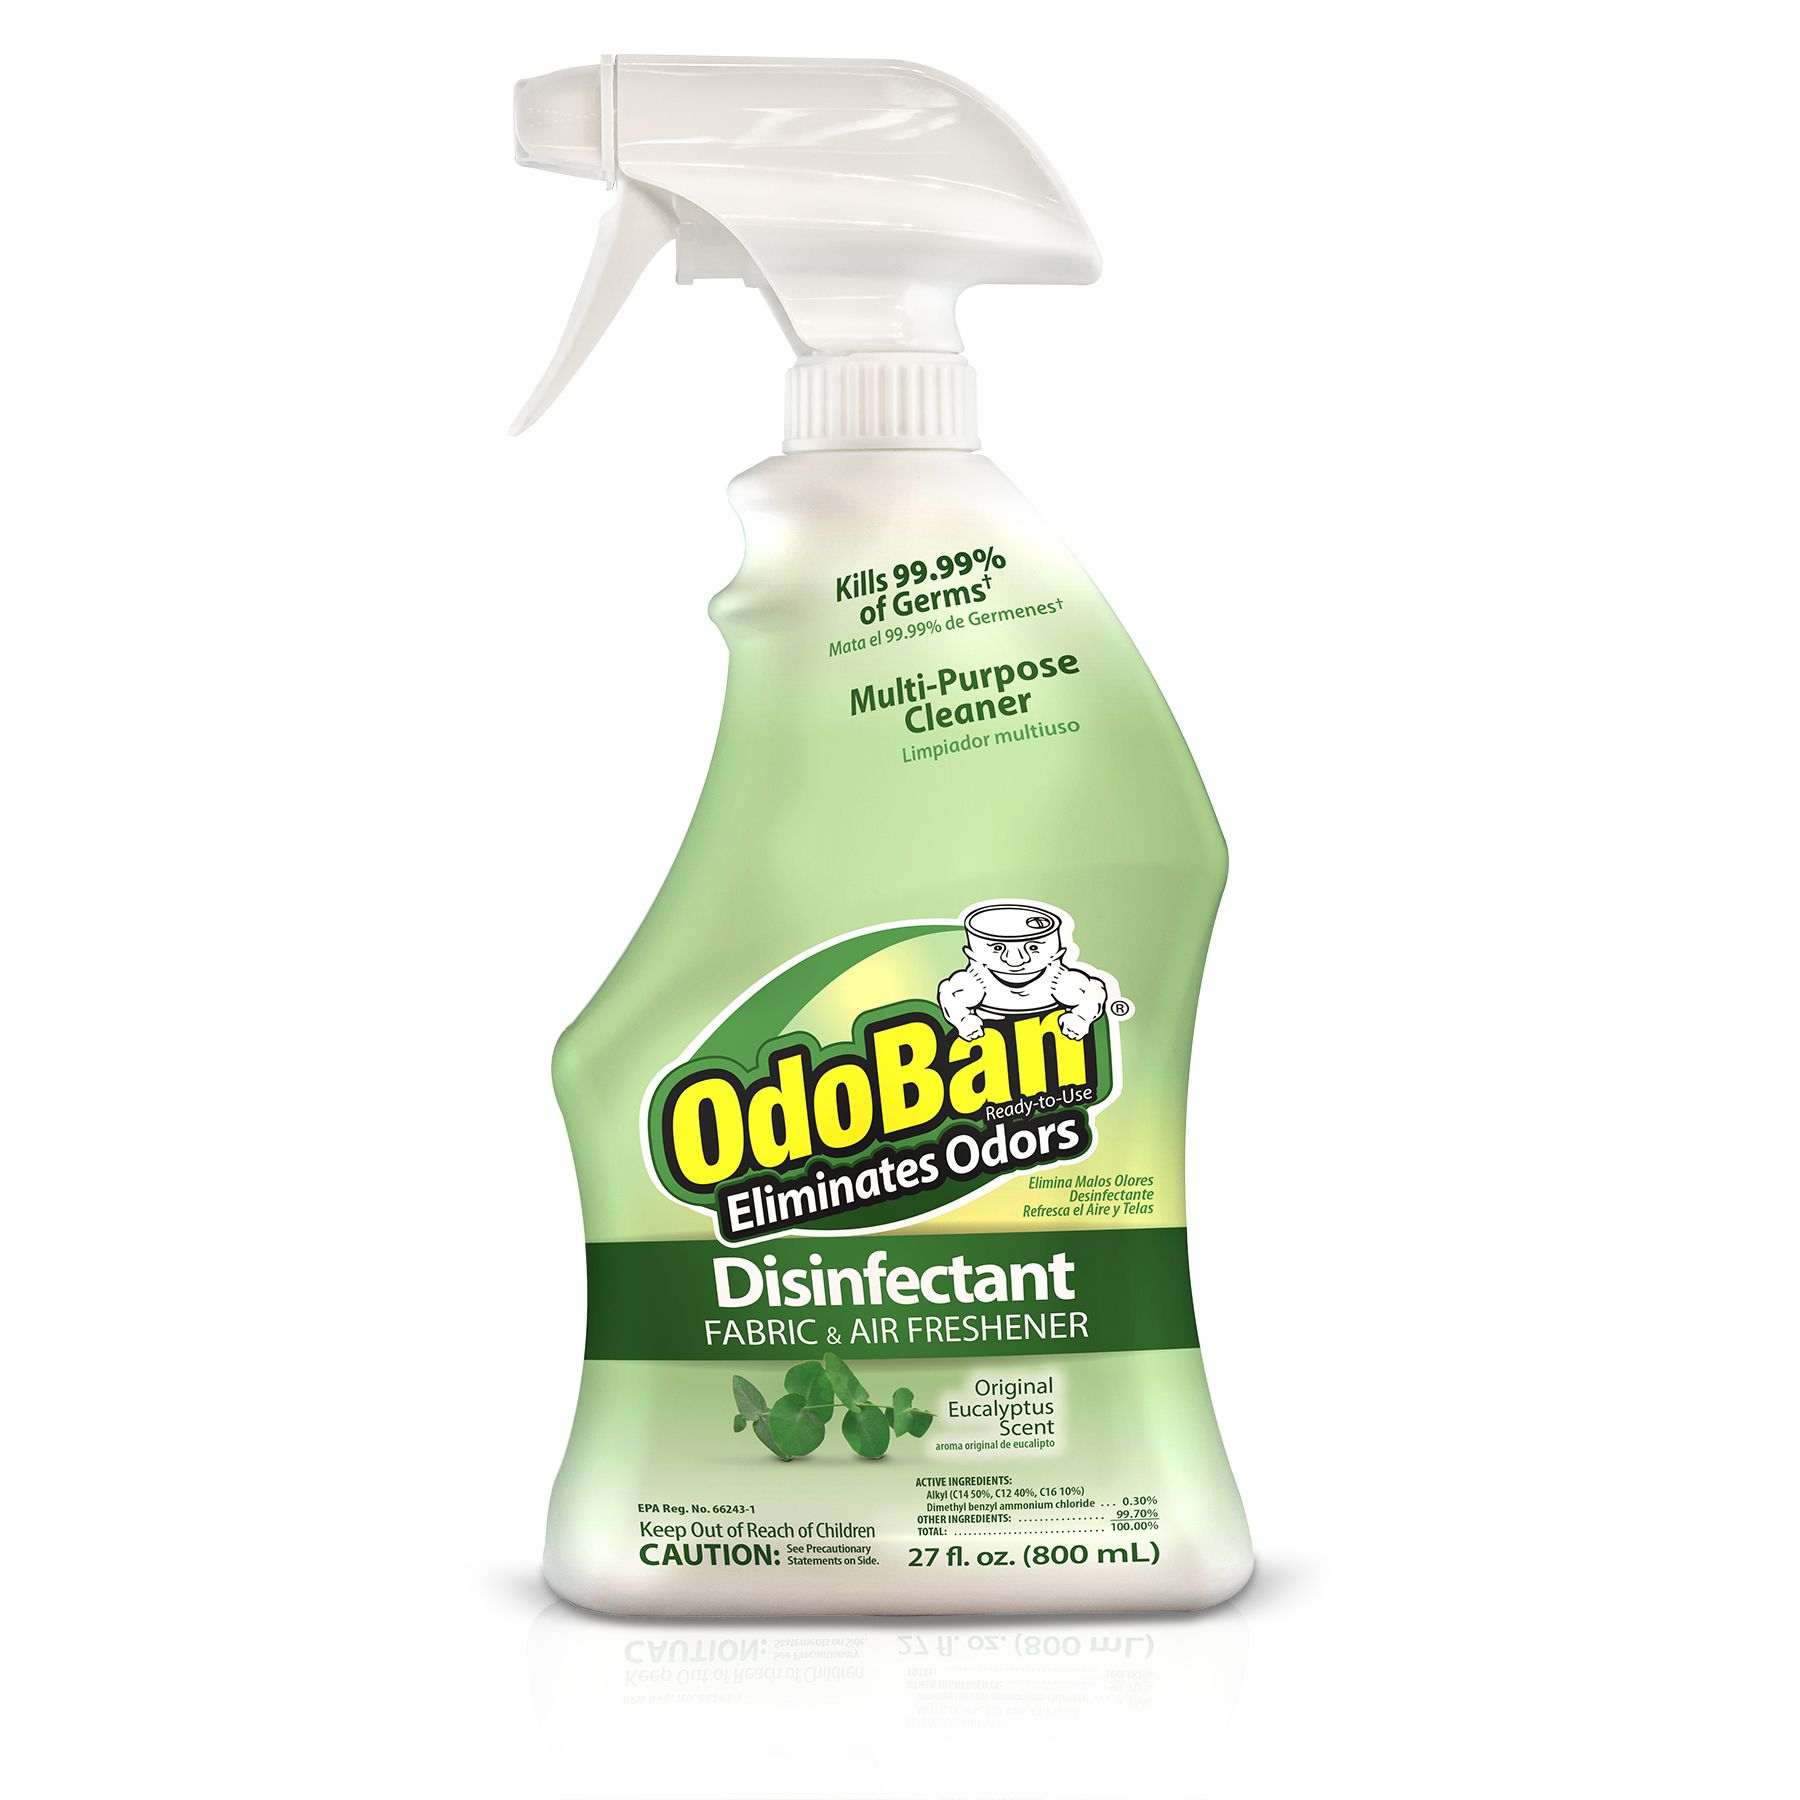 OdoBan Original Eucalyptus Scent Disinfectant Fabric & Air